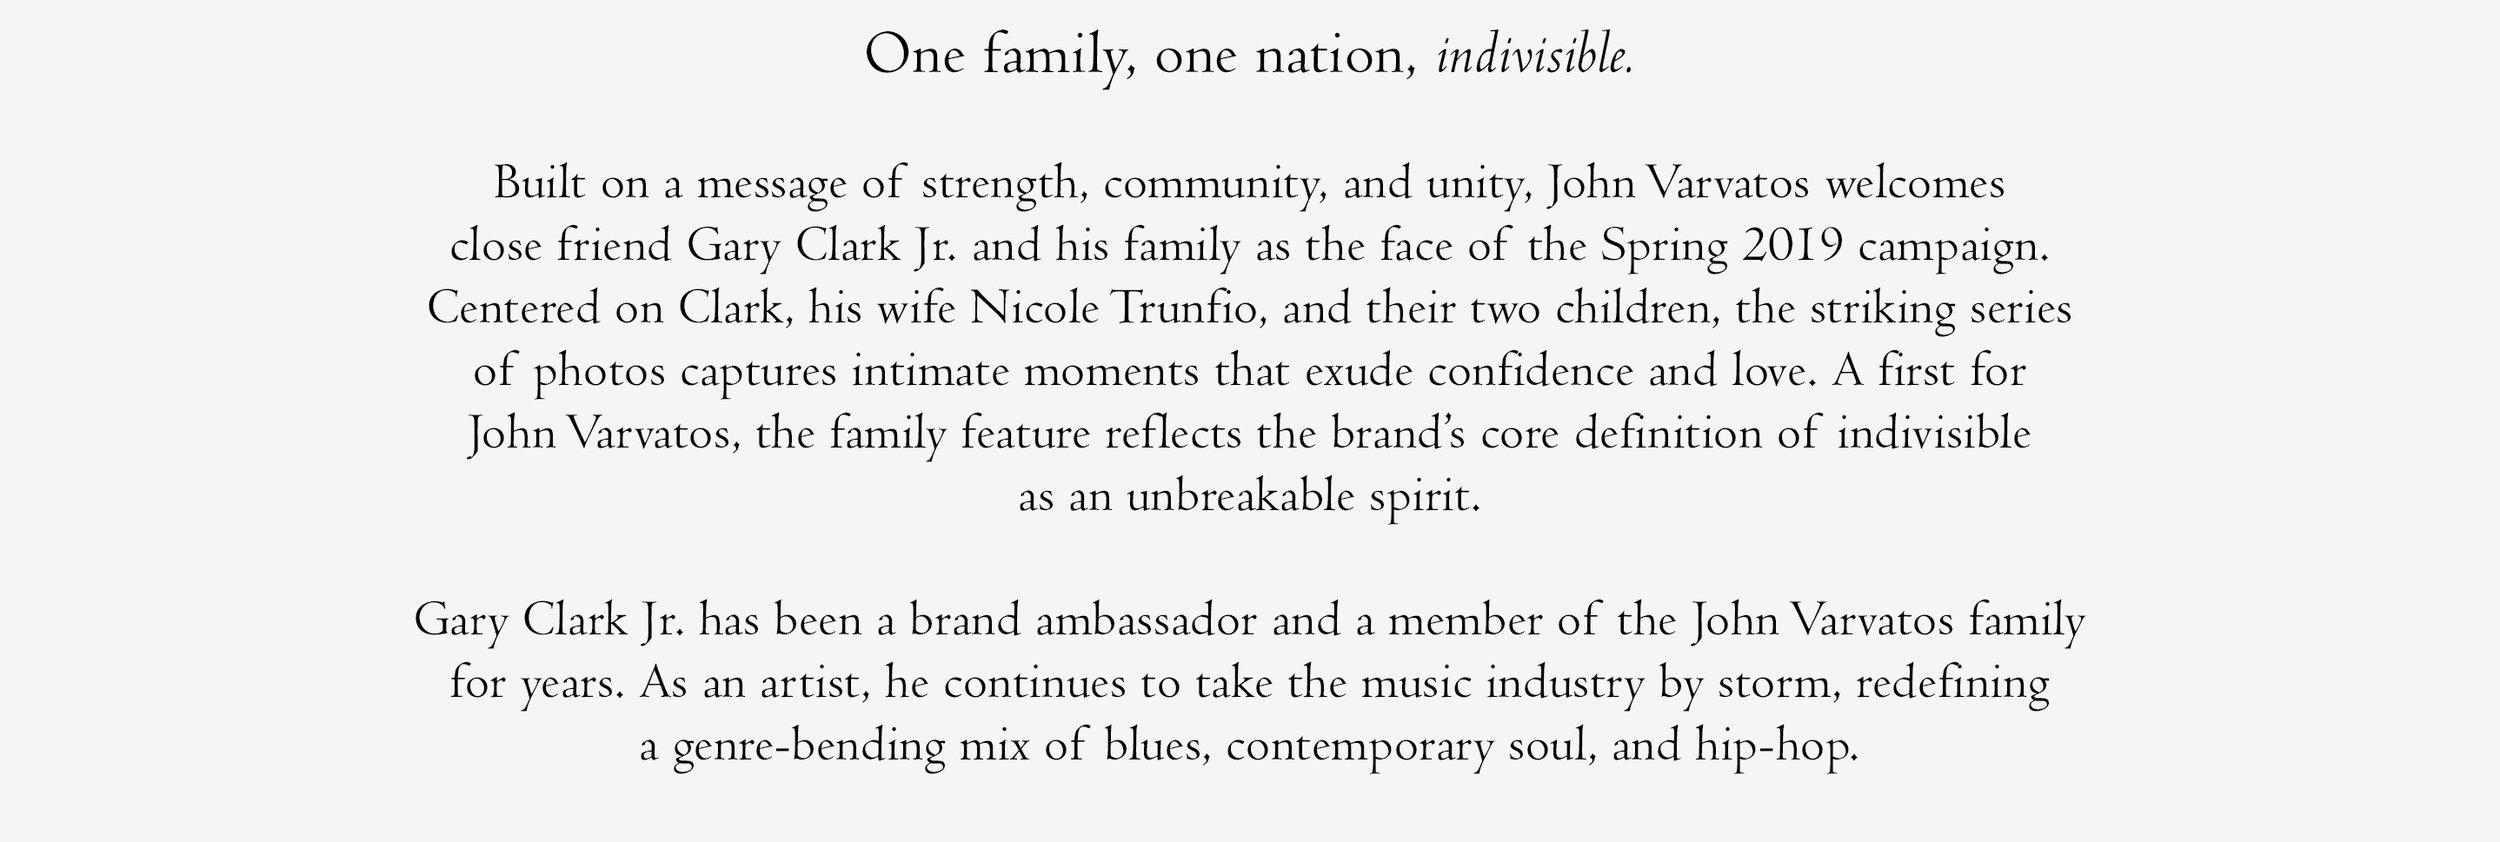 Nicole Trunfio Gary Clark Jr & Family - John Varvatos campaign 2